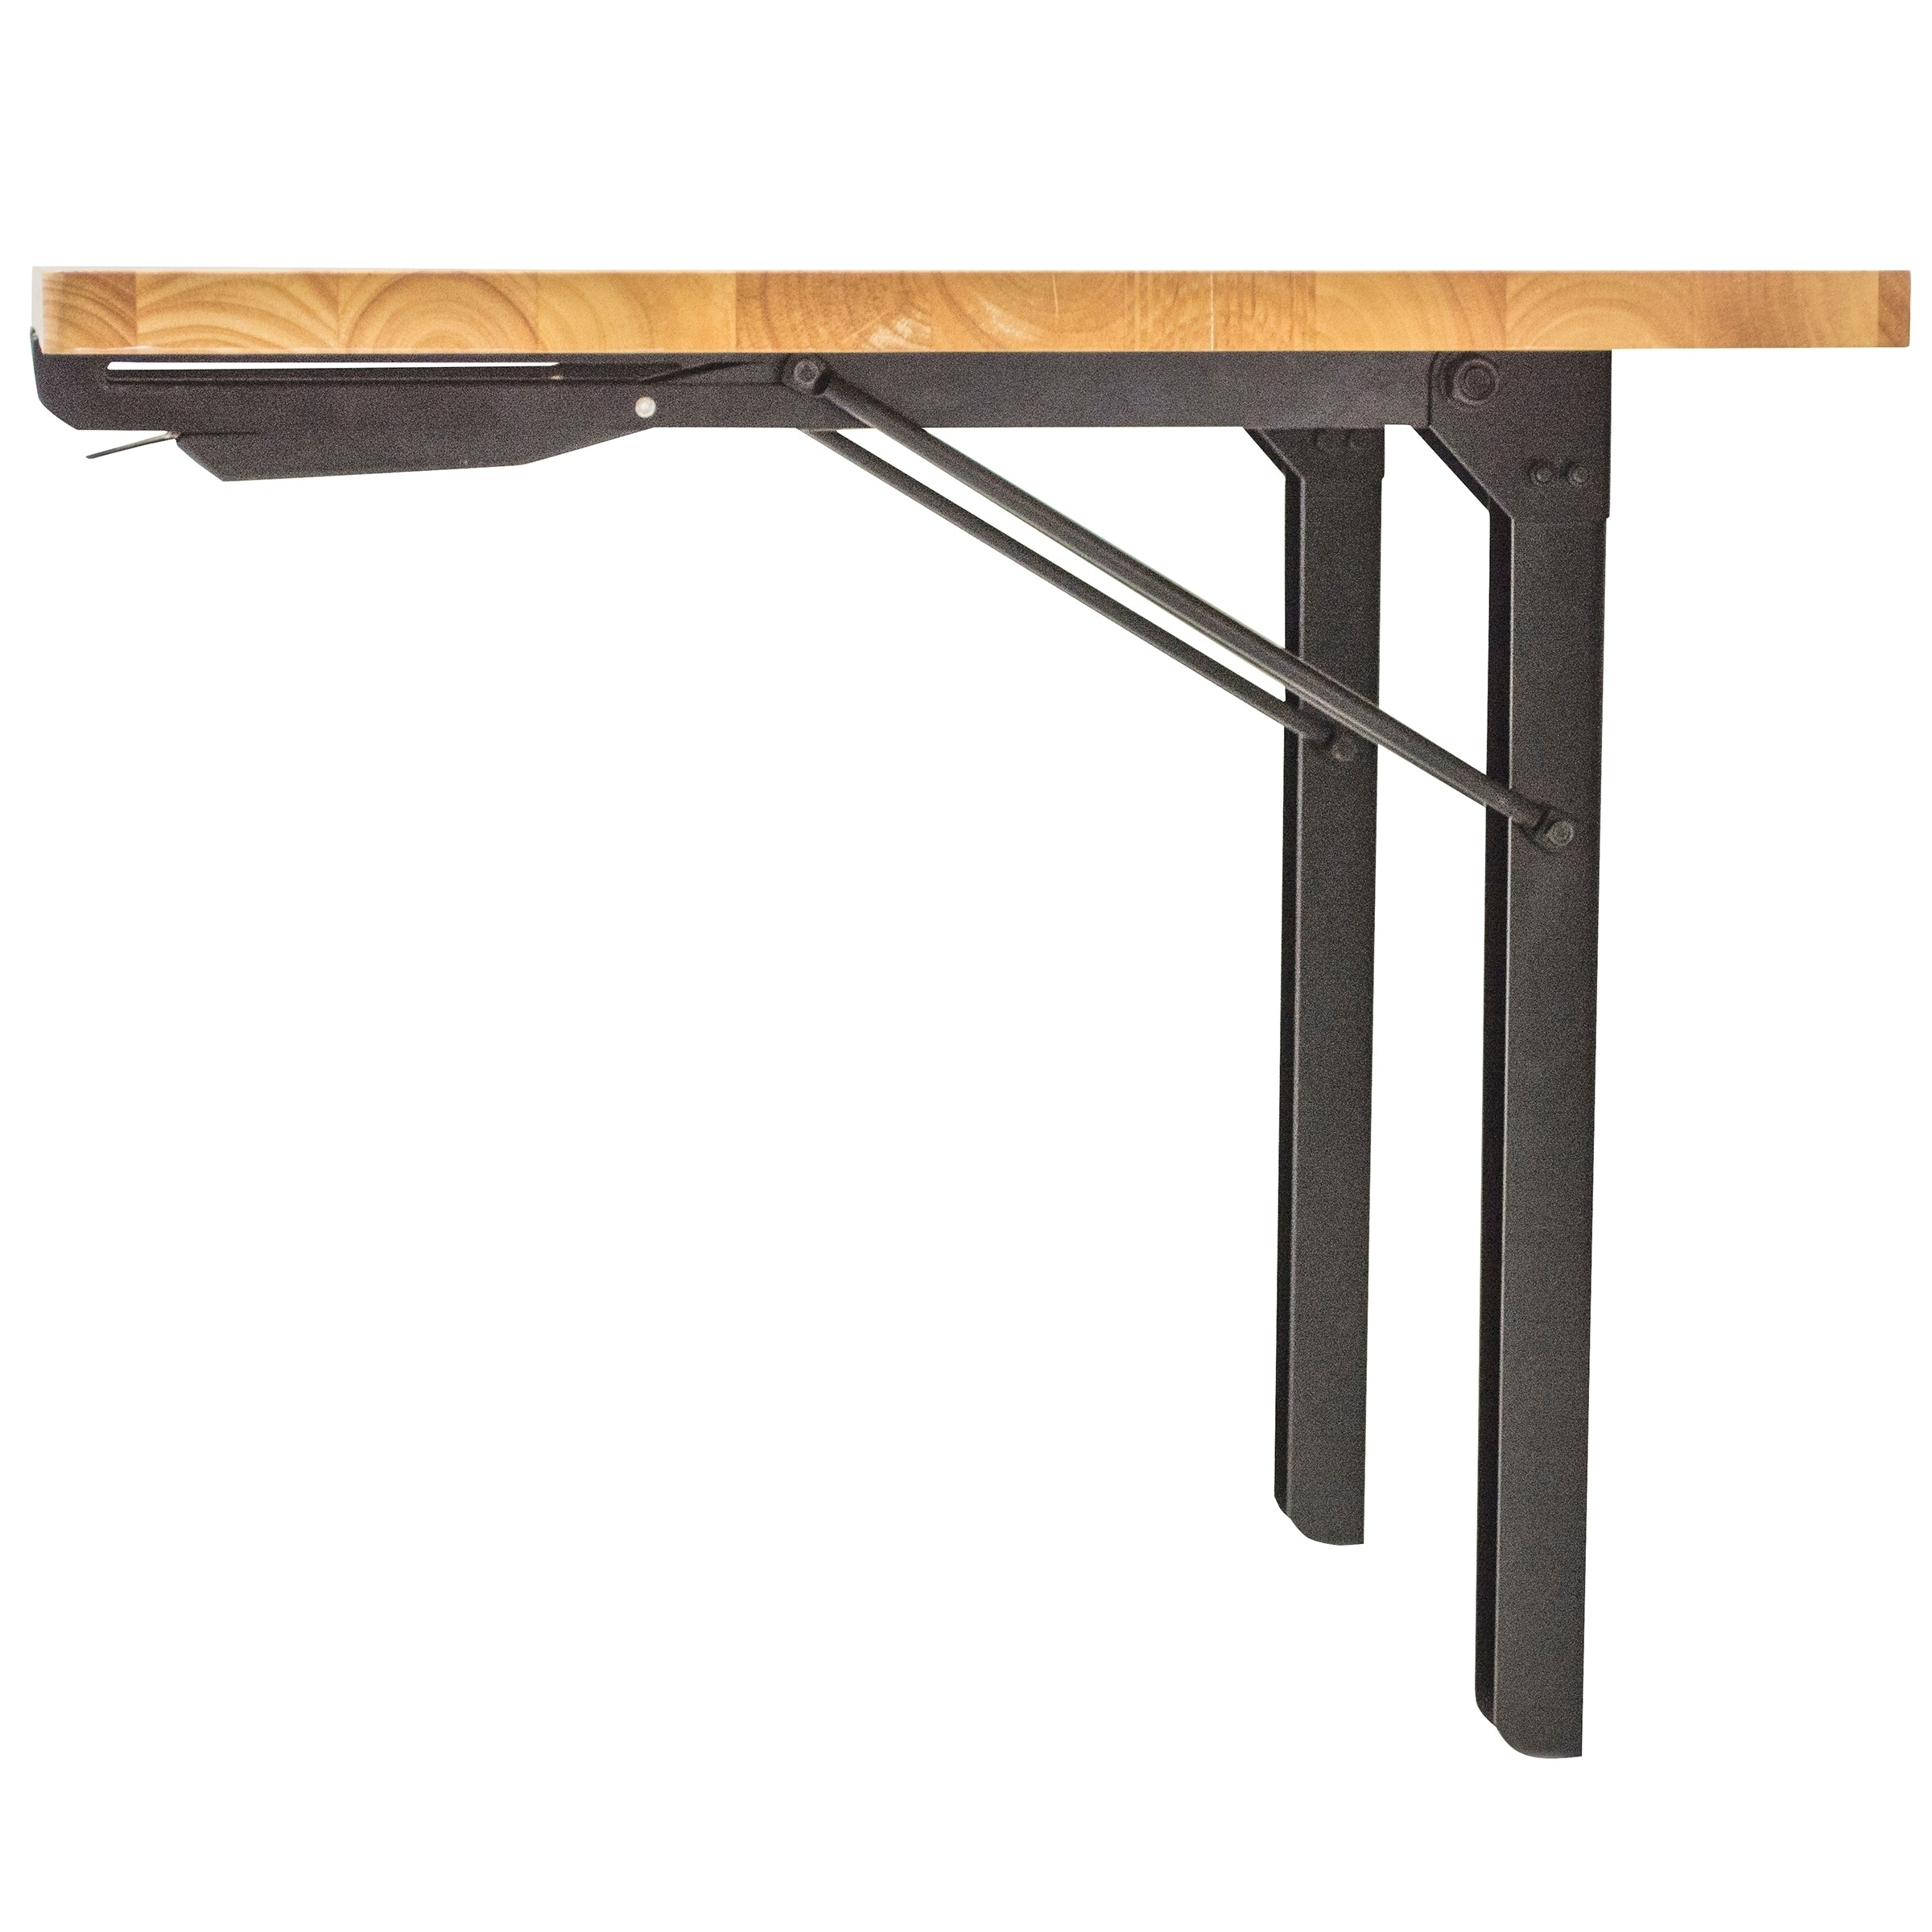 - Shop Sportsman Series Wall Mounted Folding Workbench - Overstock